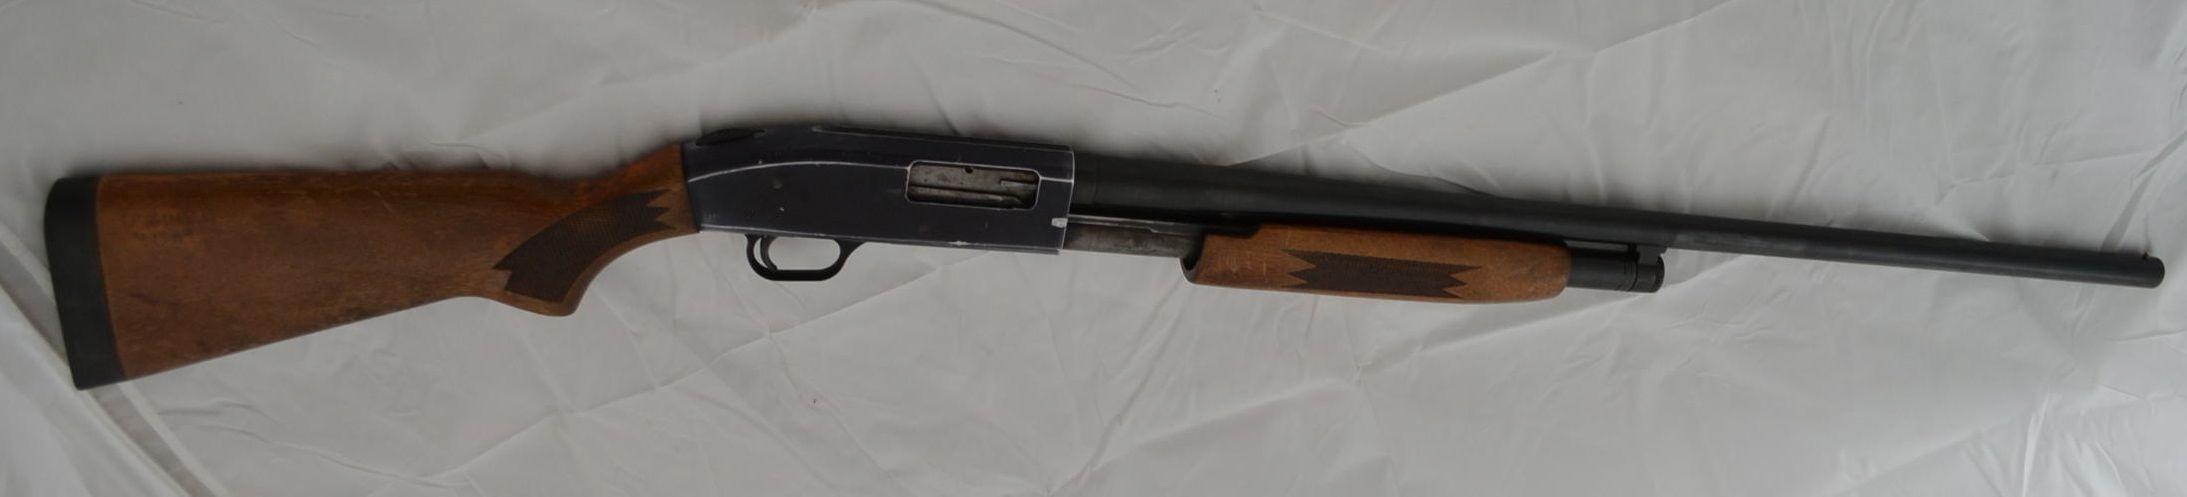 mossberg 500 30 inch full choke shotgun 2 – rifleshooter com